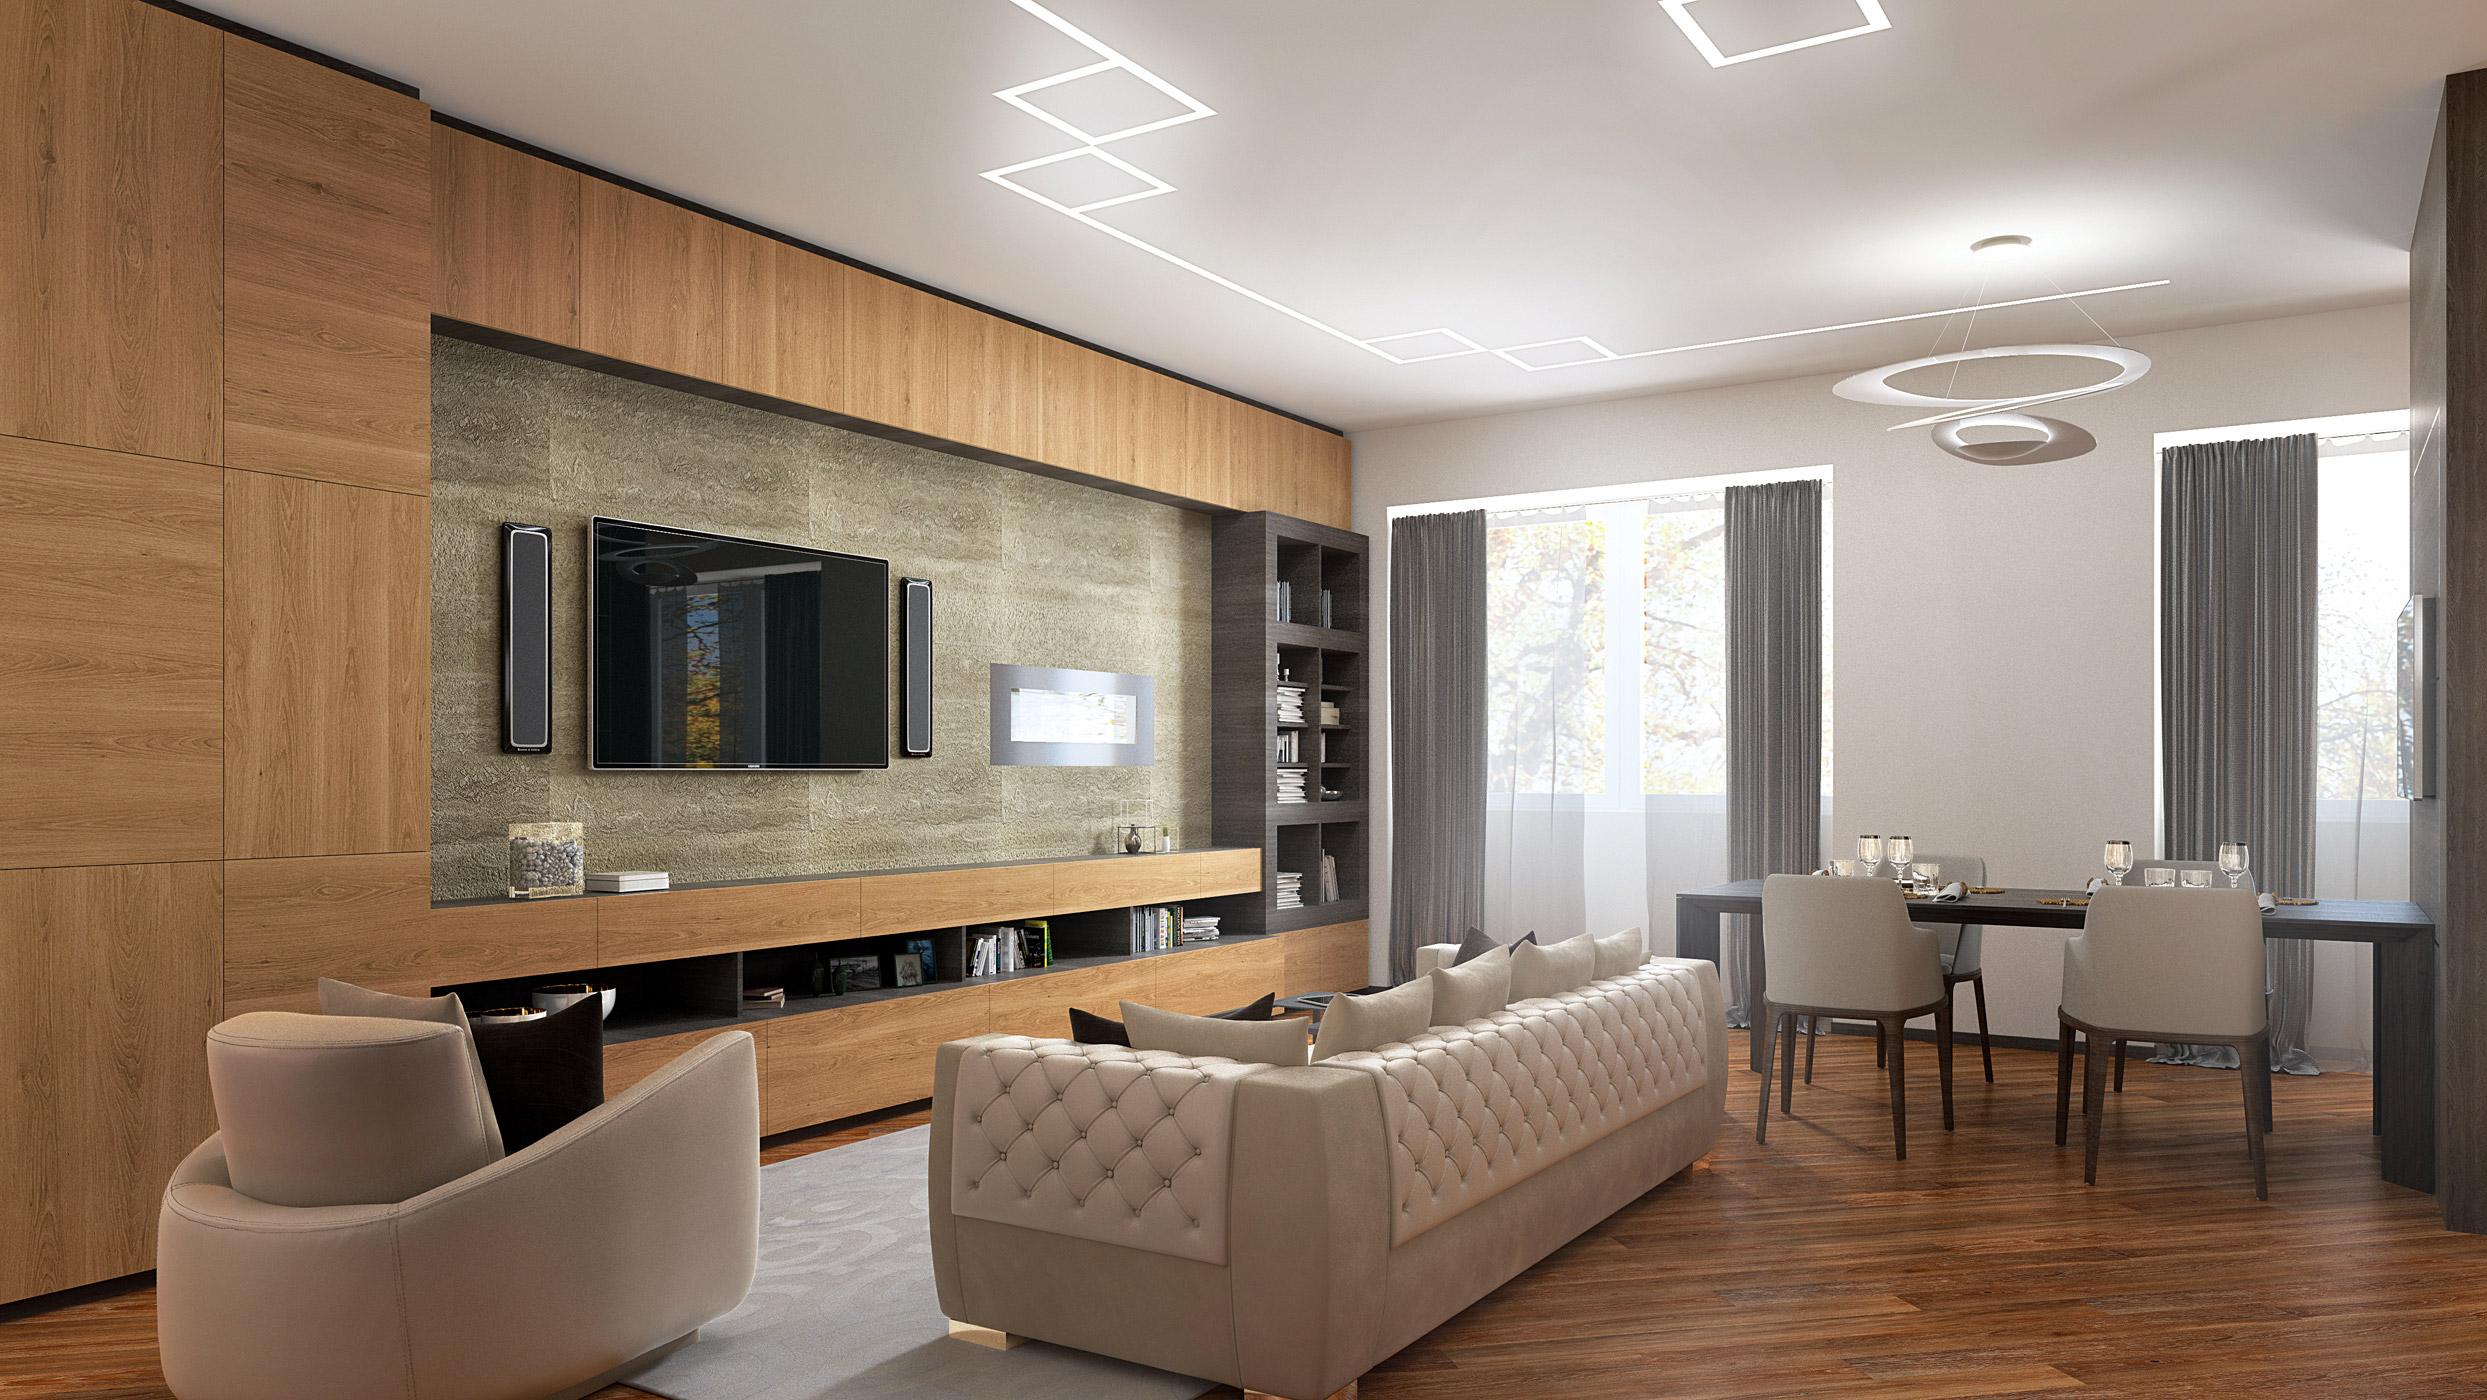 Living and Kitchen - Rampoldi Creations - Rampoldi Creations